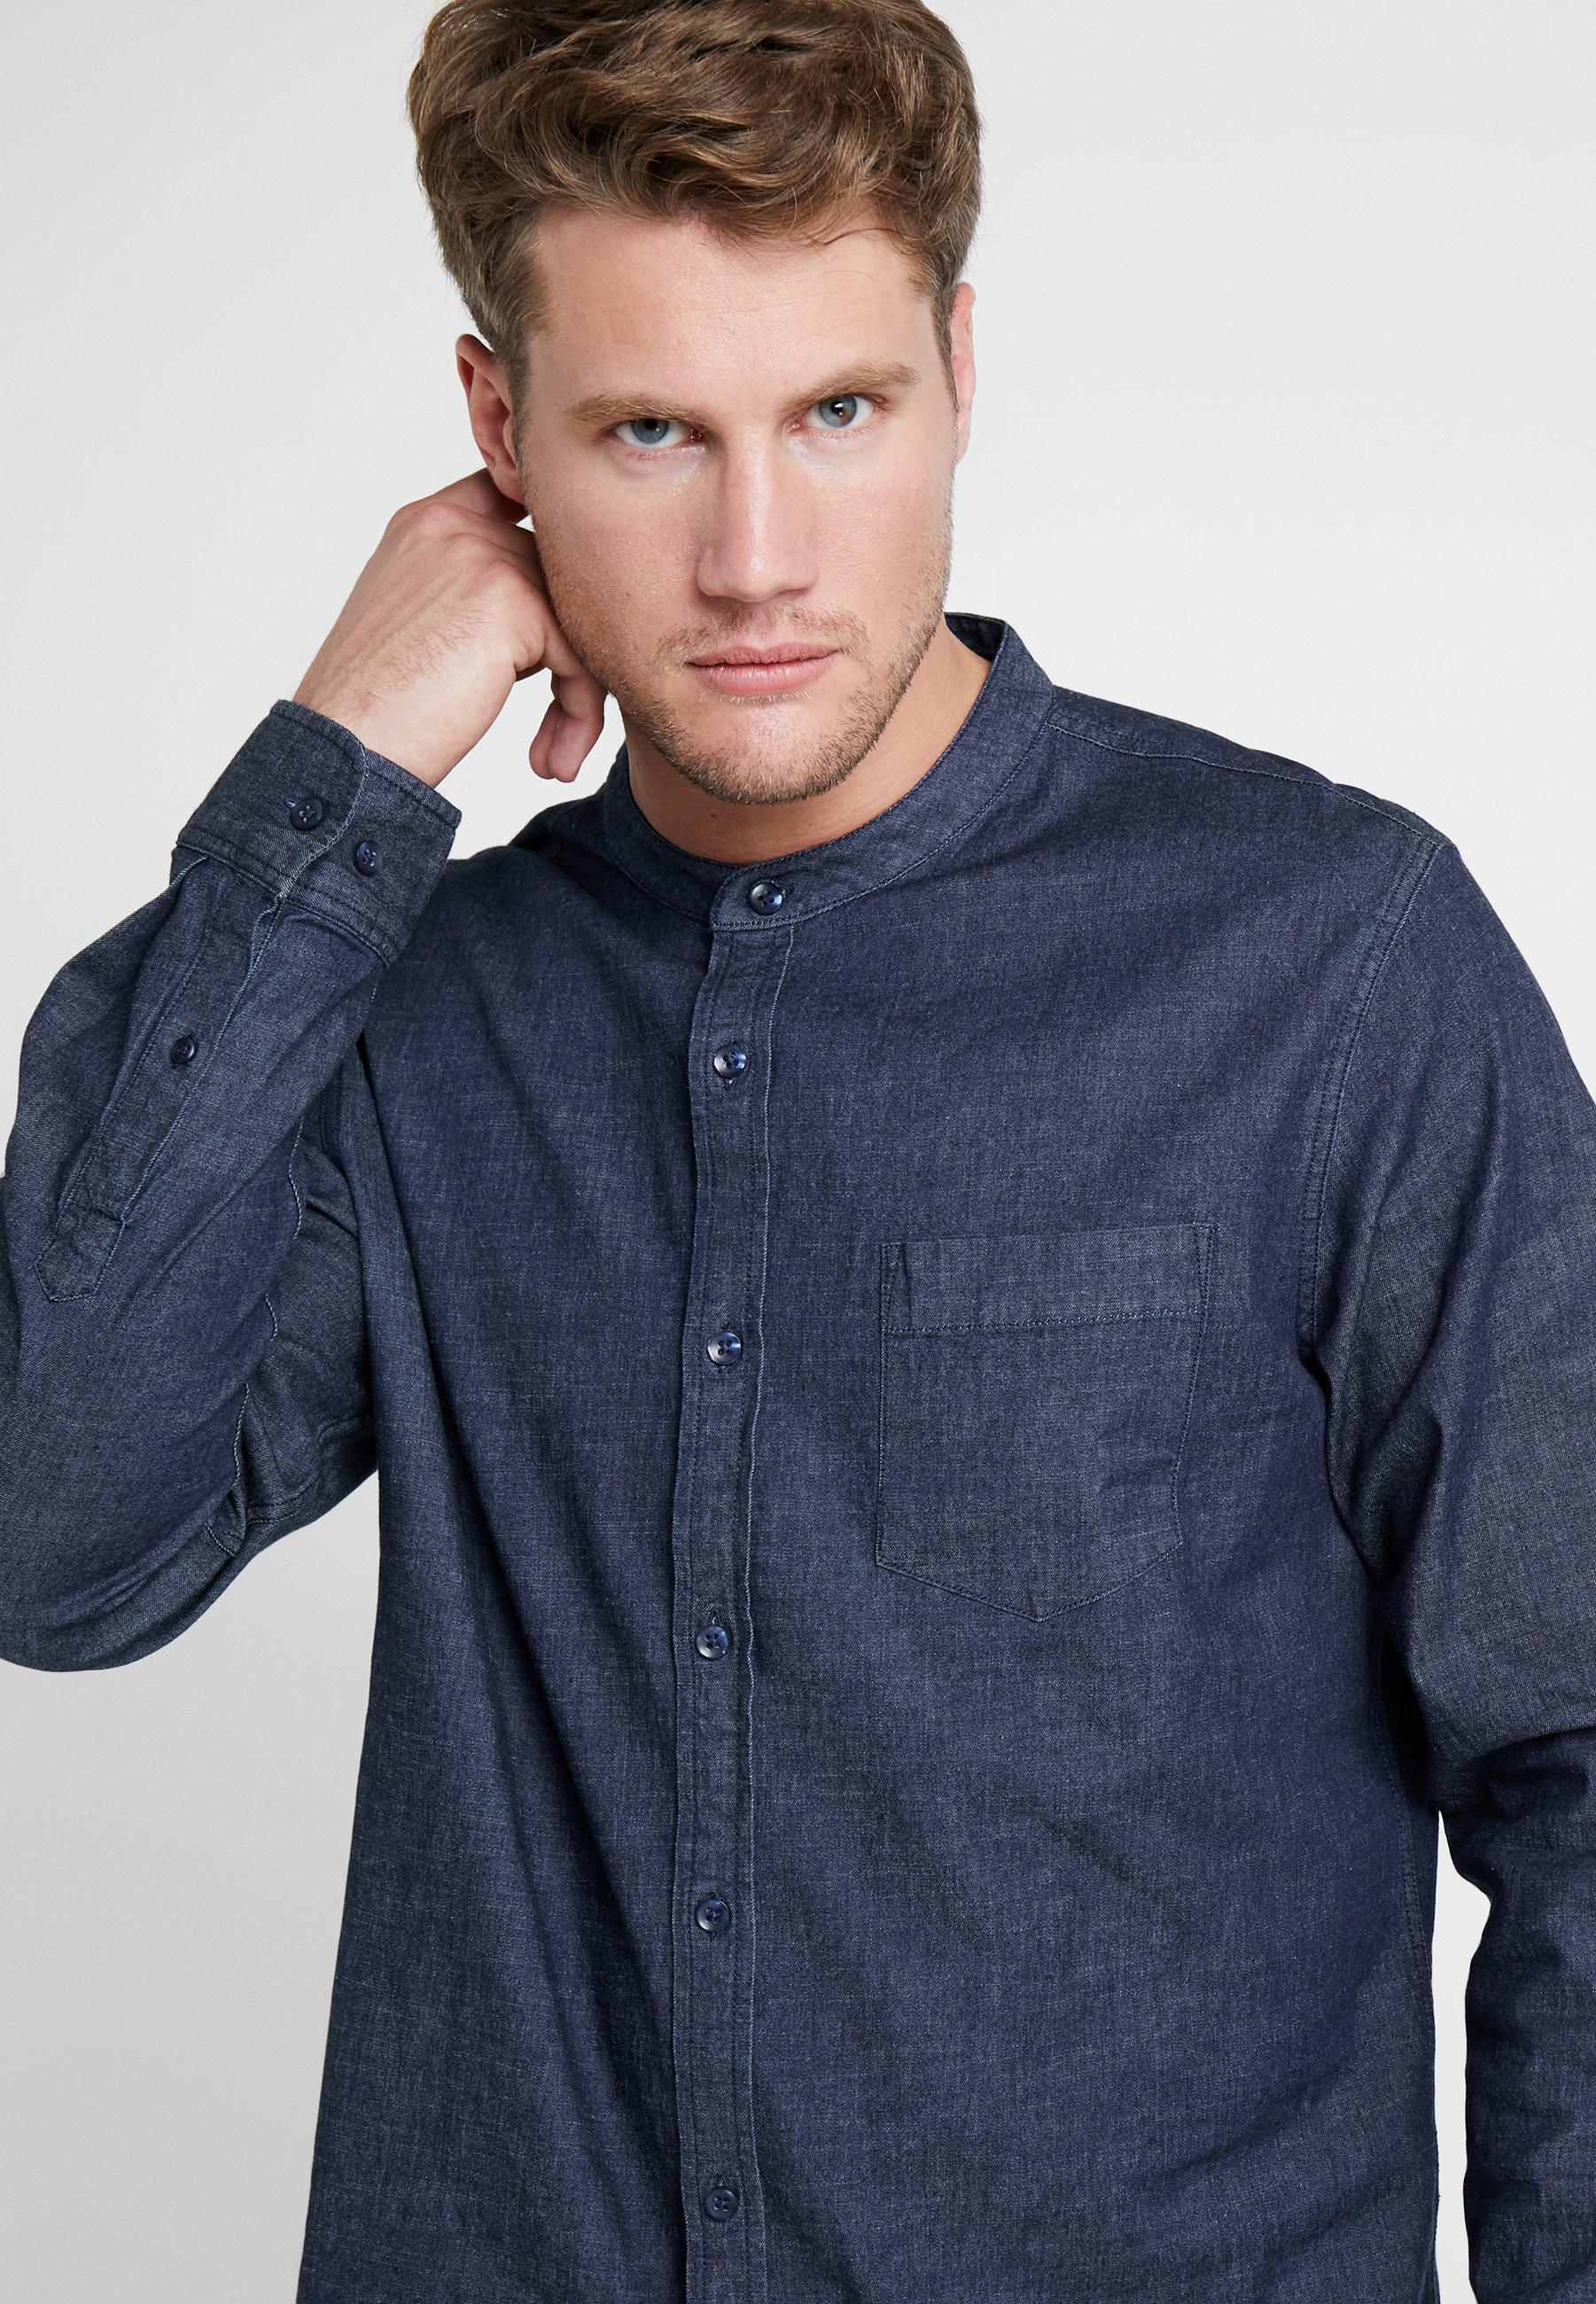 Bergans OSLO SHIRT Skjorte dark denimblå denim Zalando.no